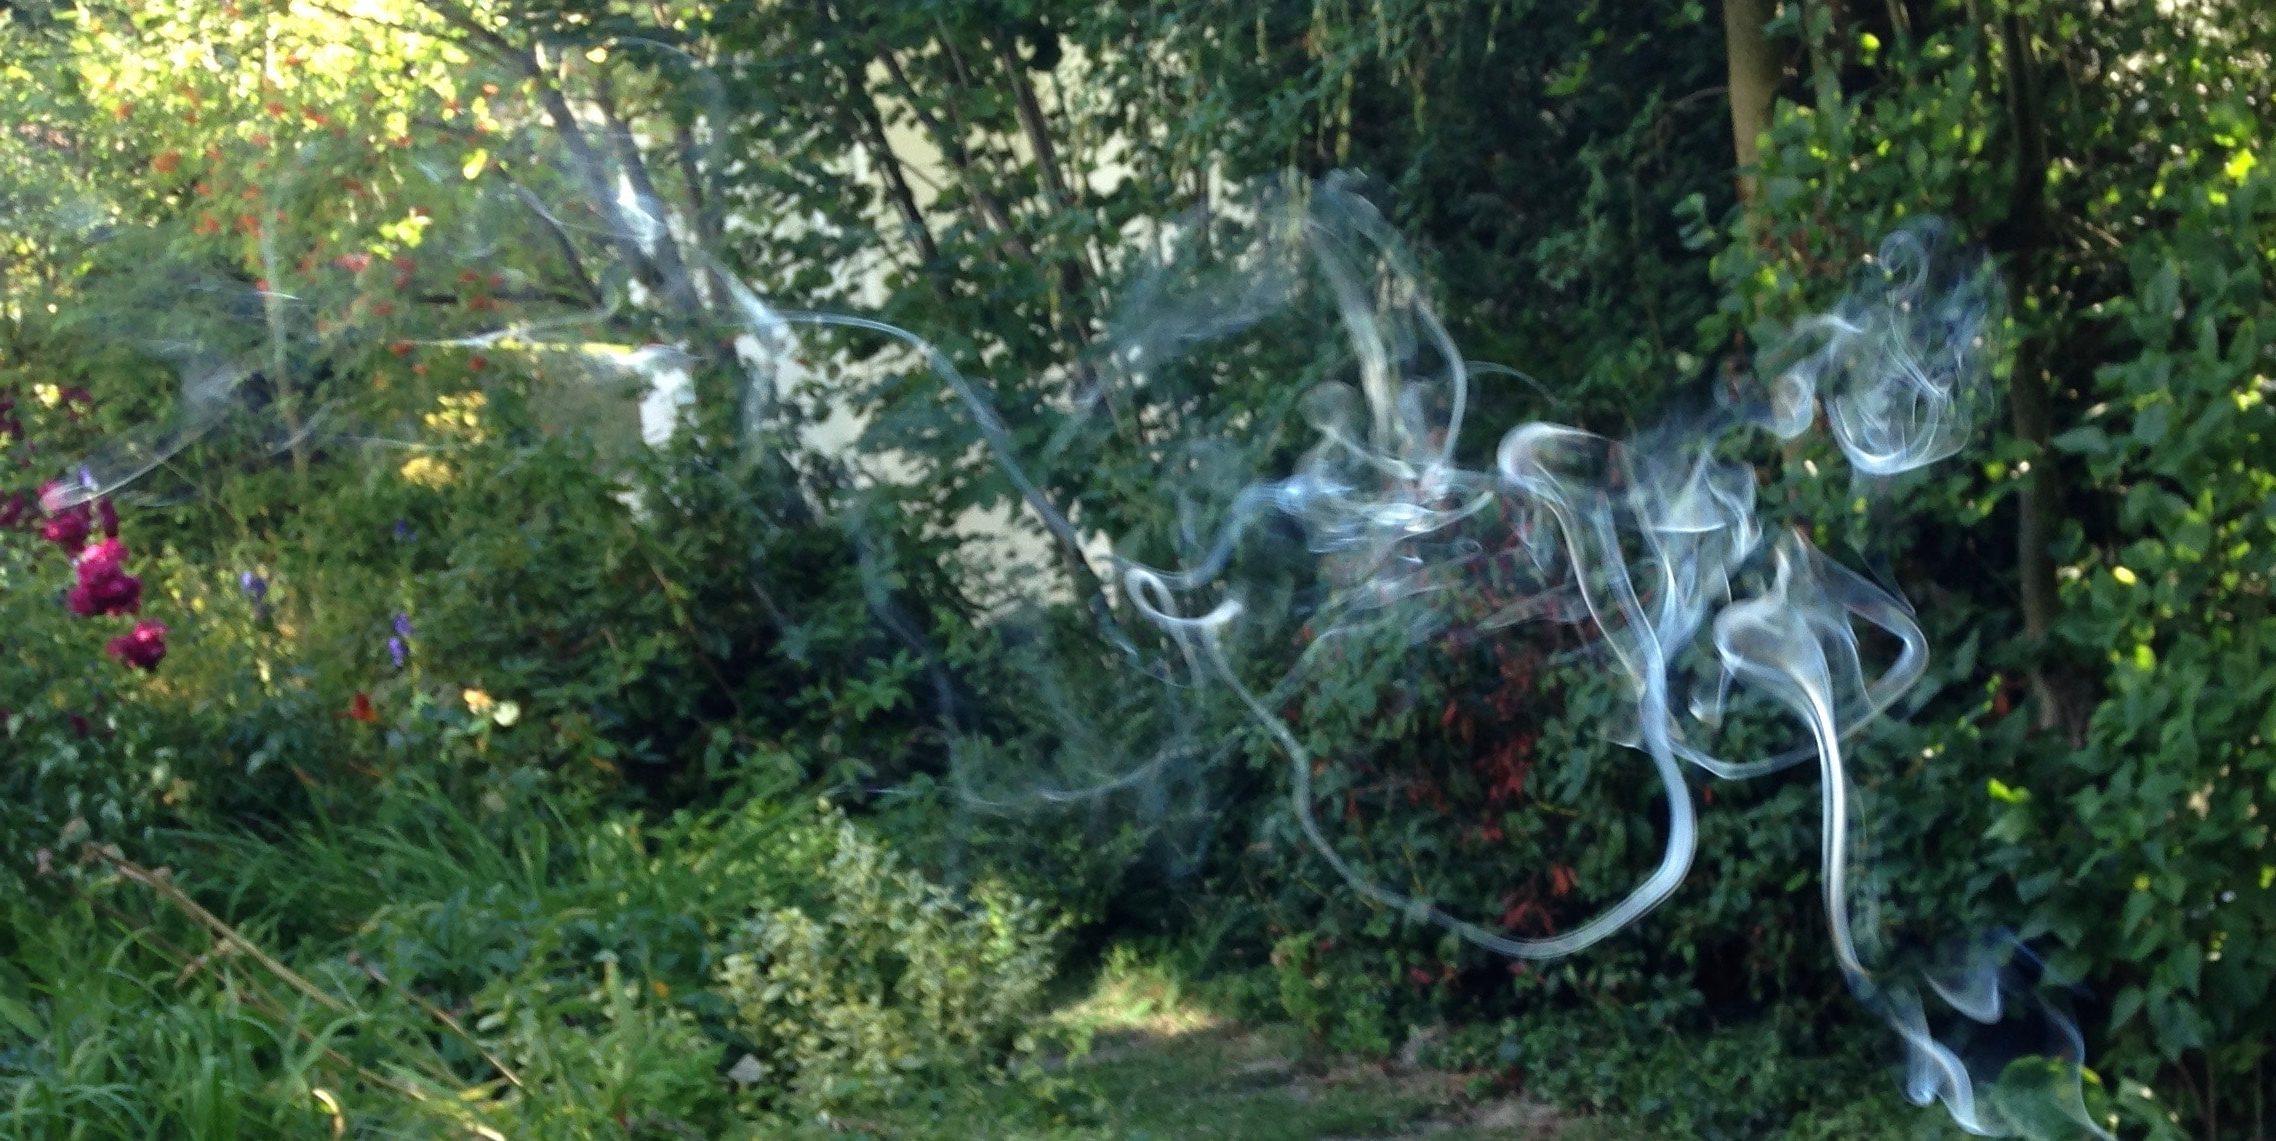 graue Rauchschwaden ziehen durch den grünen Garten